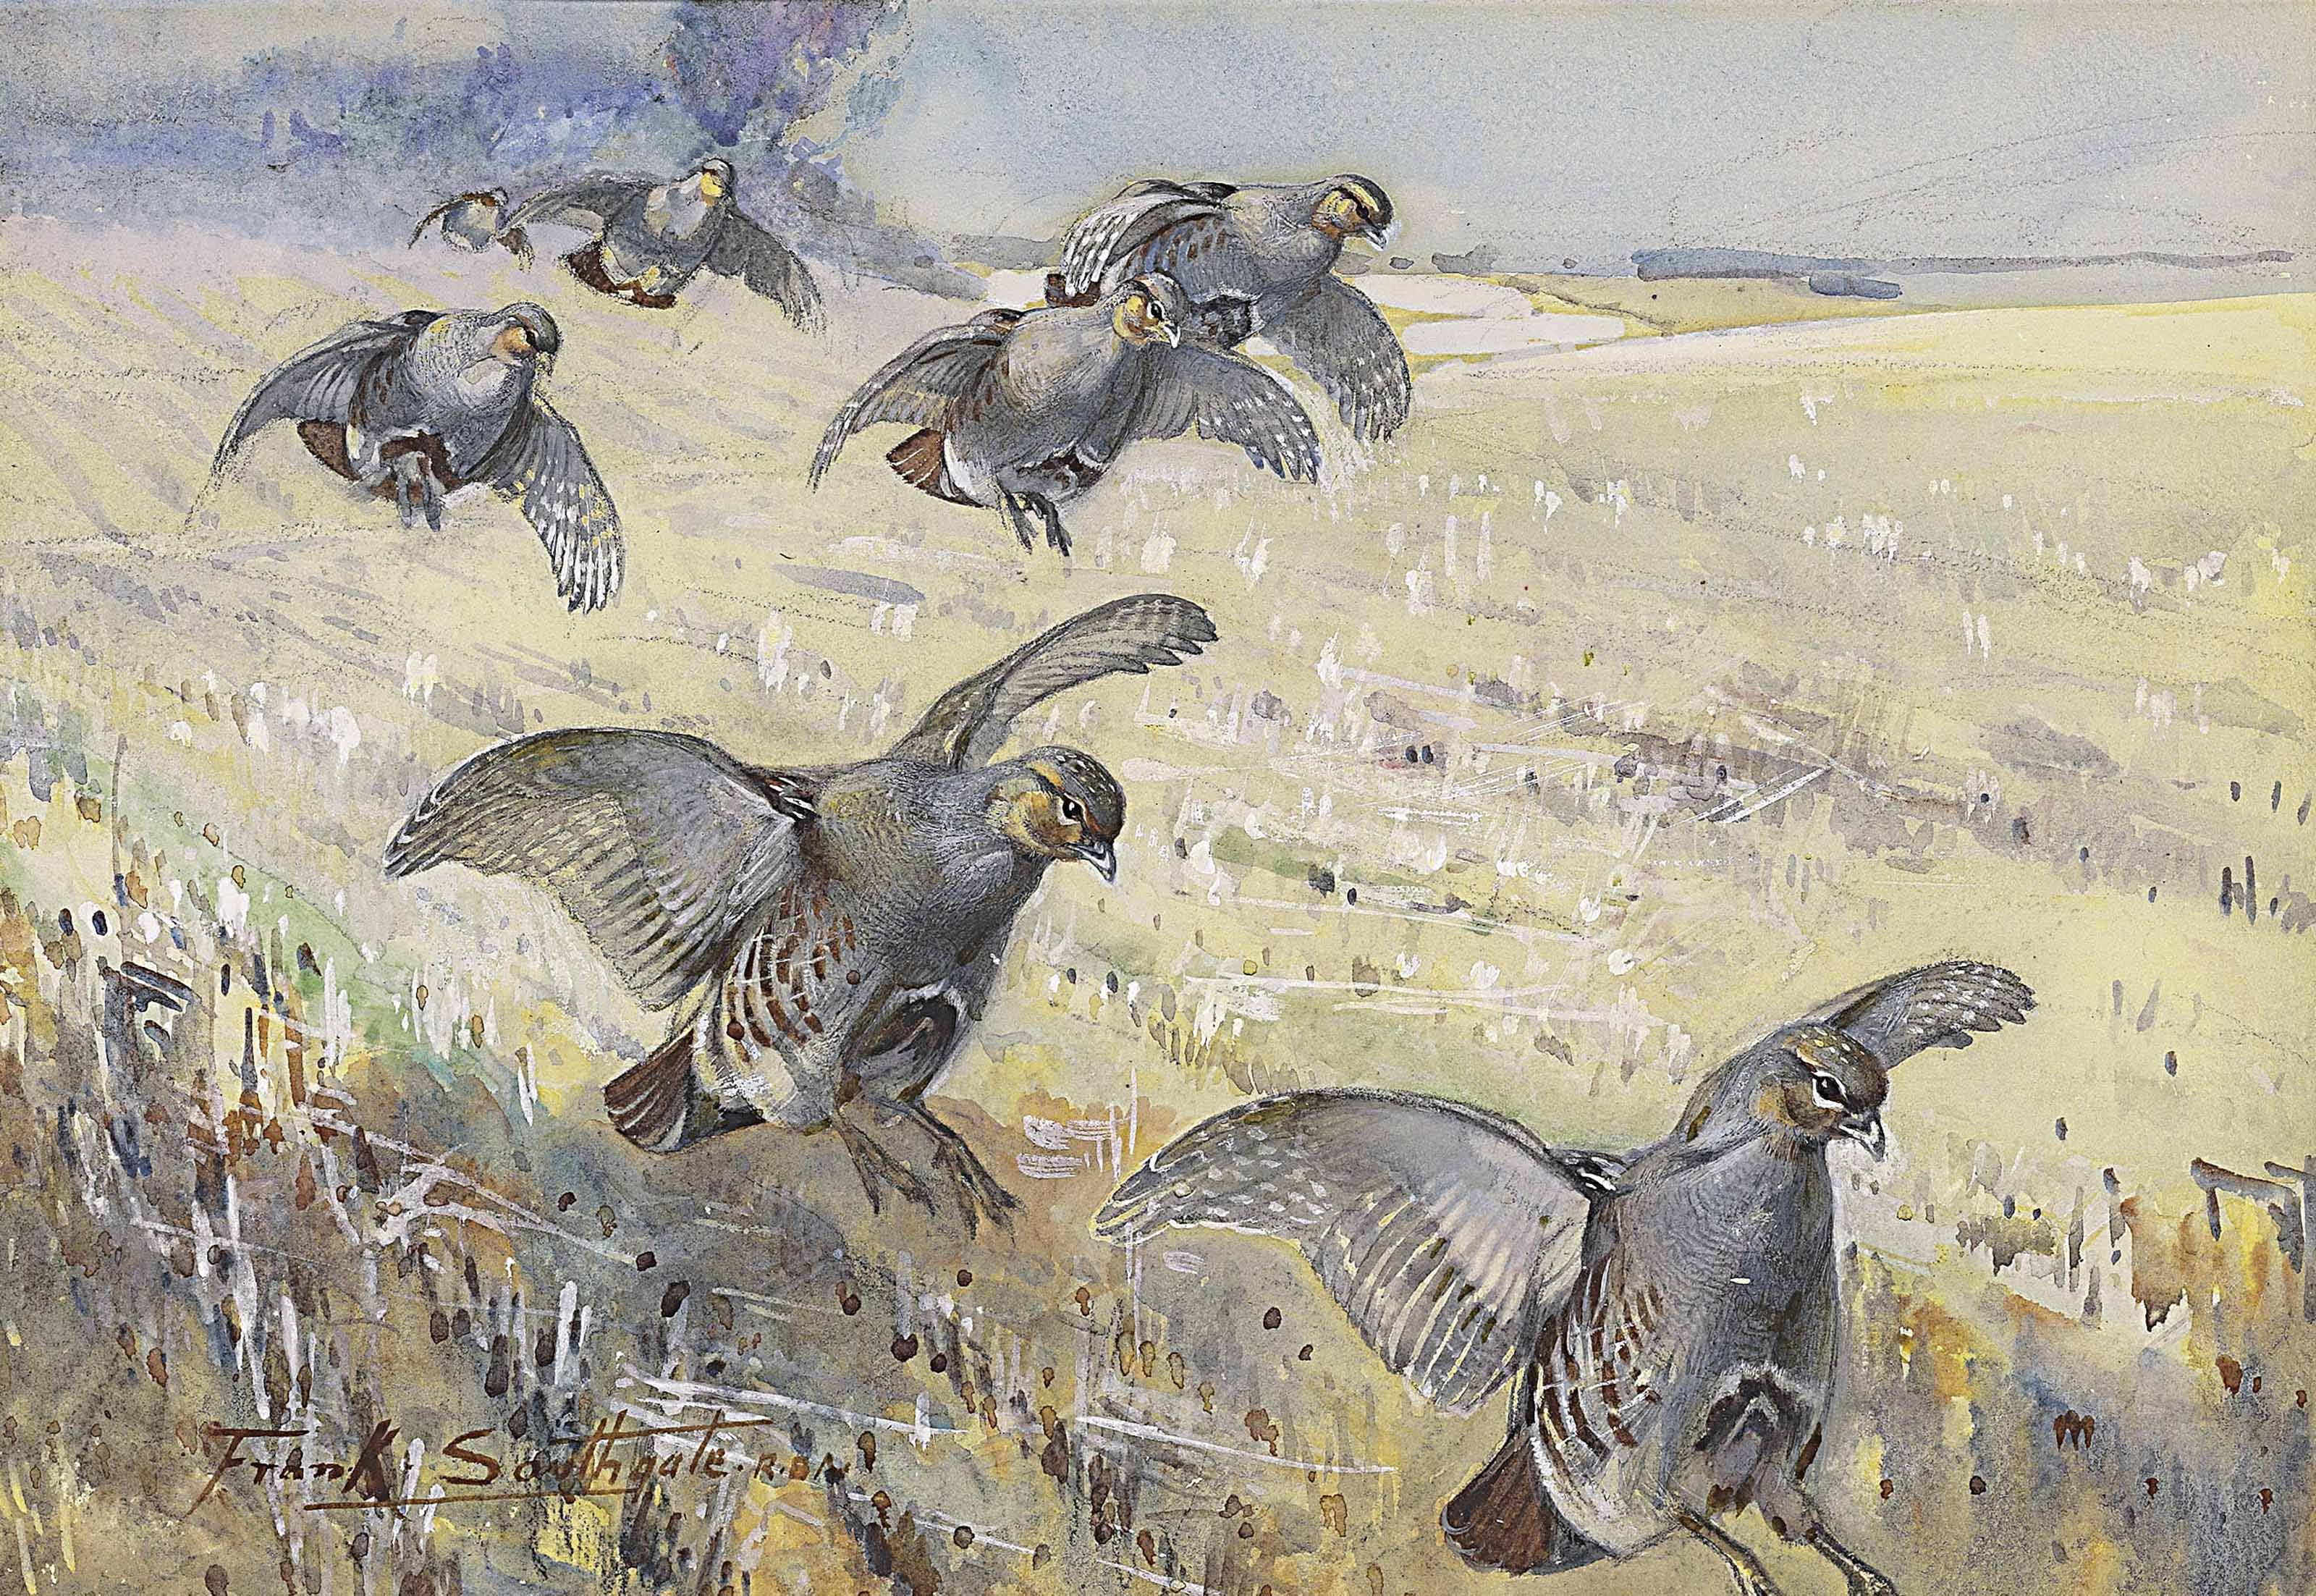 Partridge alighting on a corn field